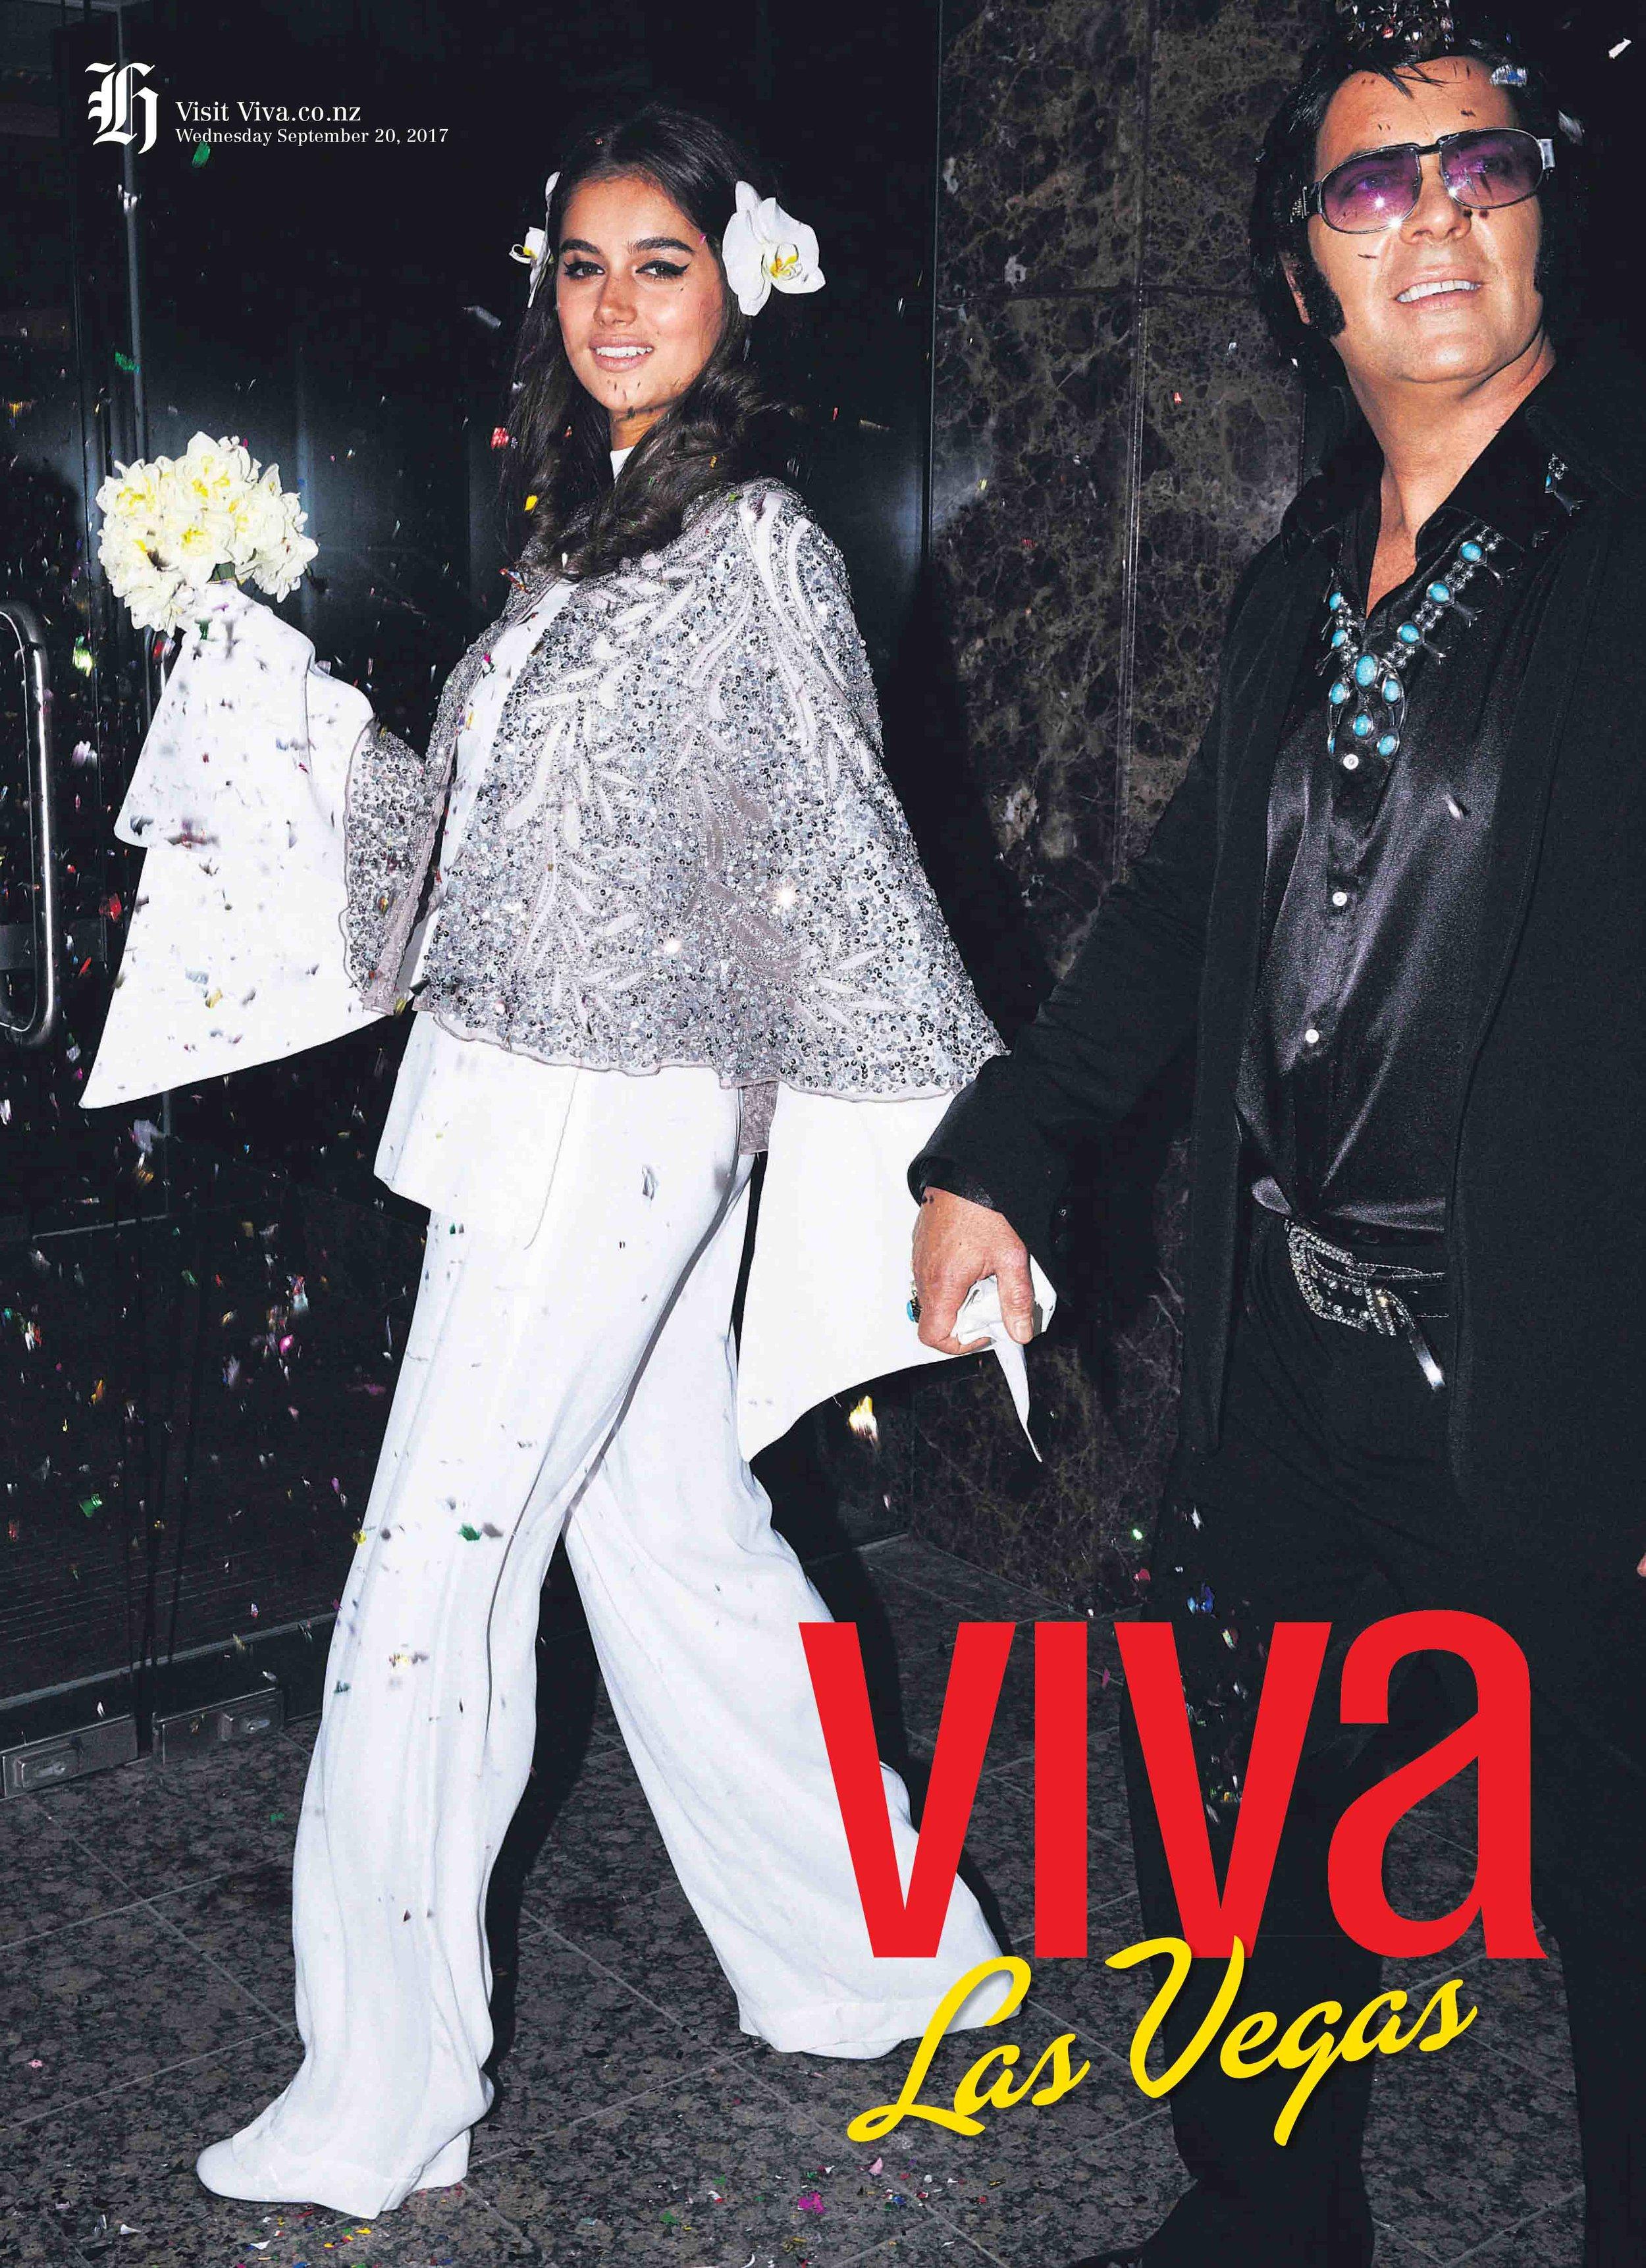 VIVA20SEP17C001.jpg